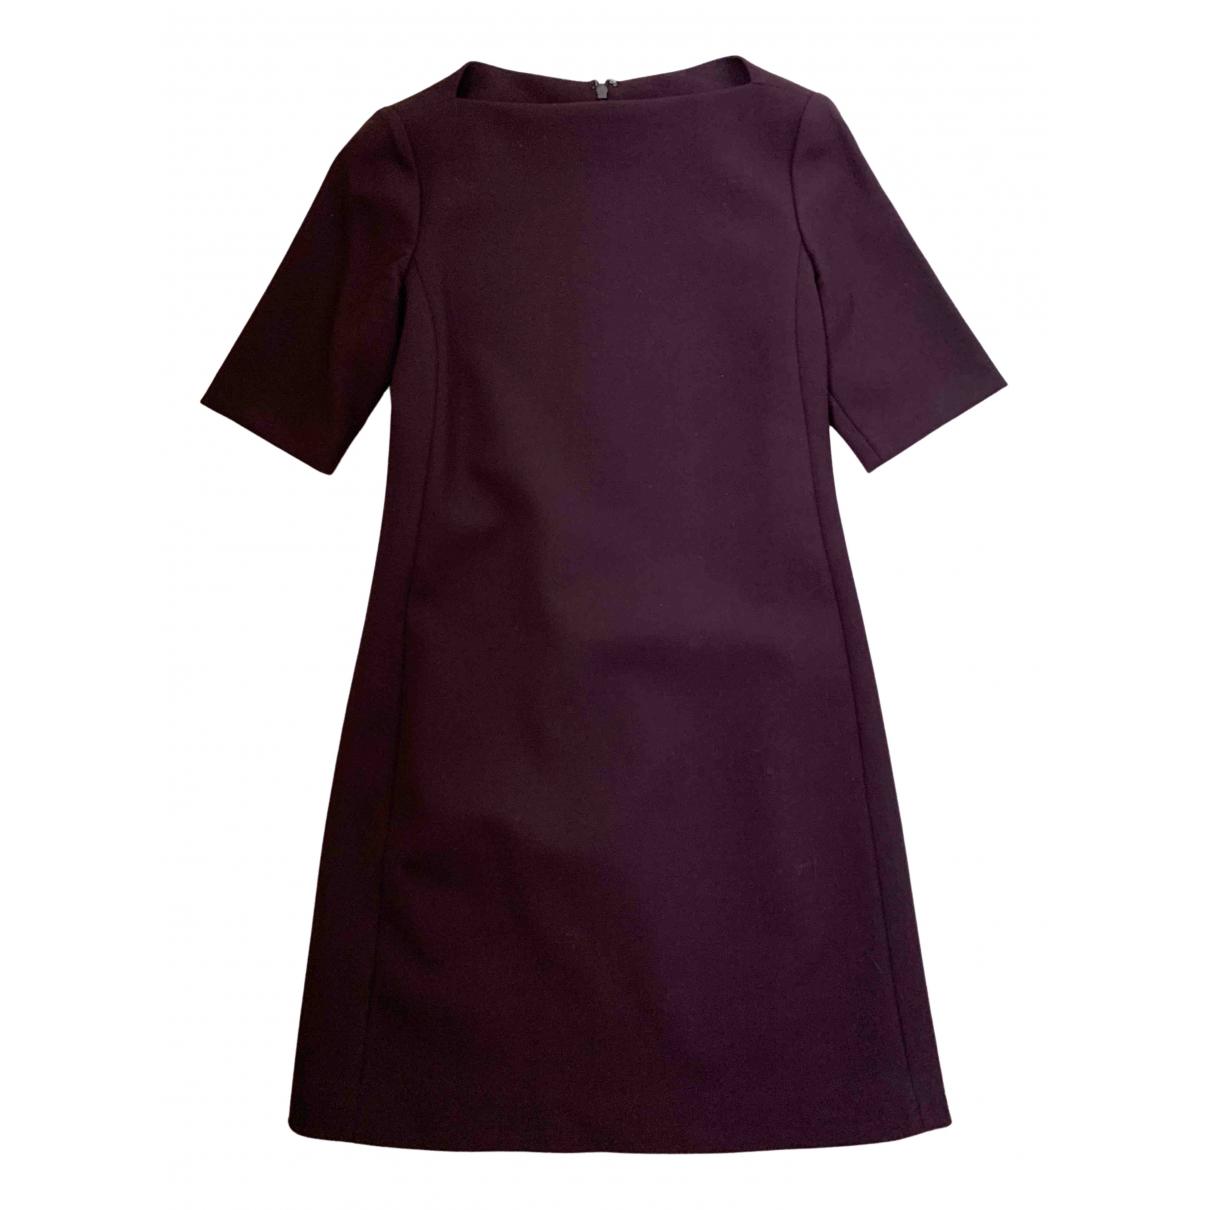 Theory \N Kleid in  Bordeauxrot Wolle